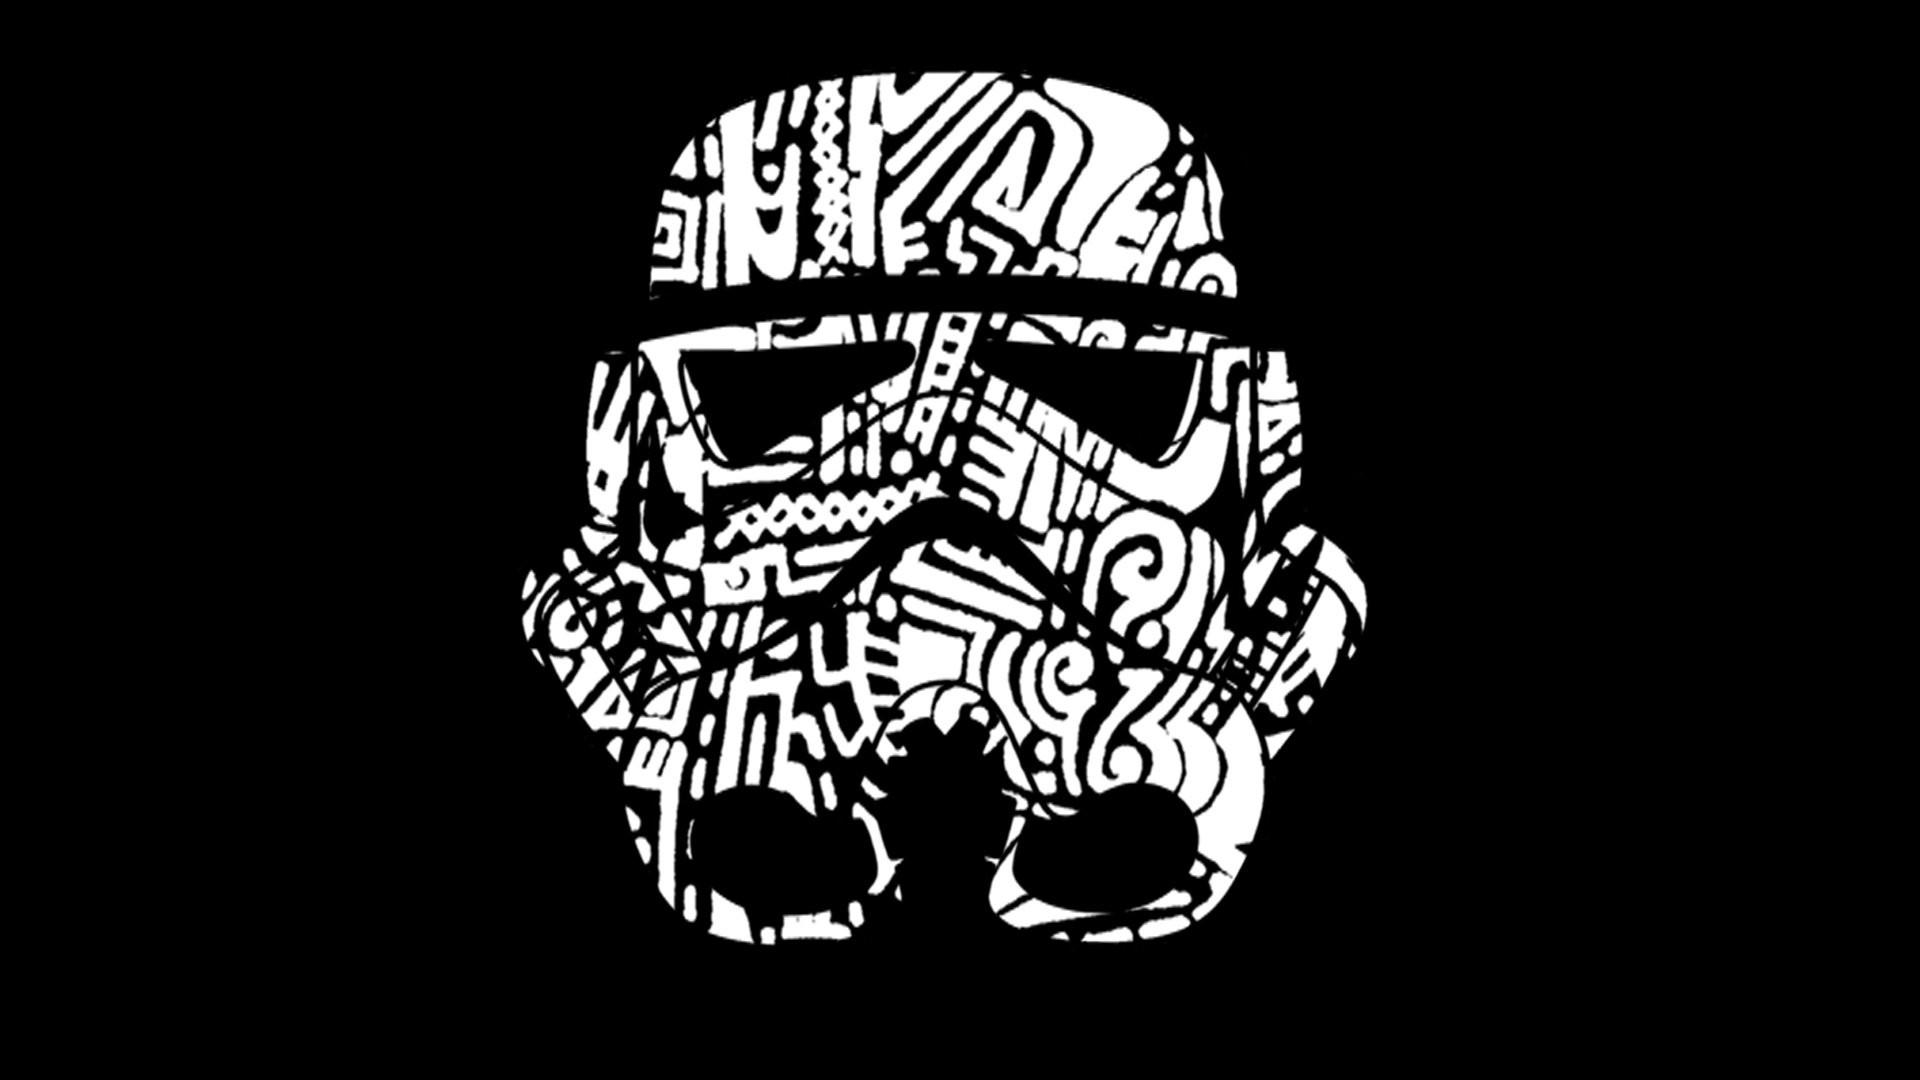 Movie – Star Wars Stormtrooper Wallpaper